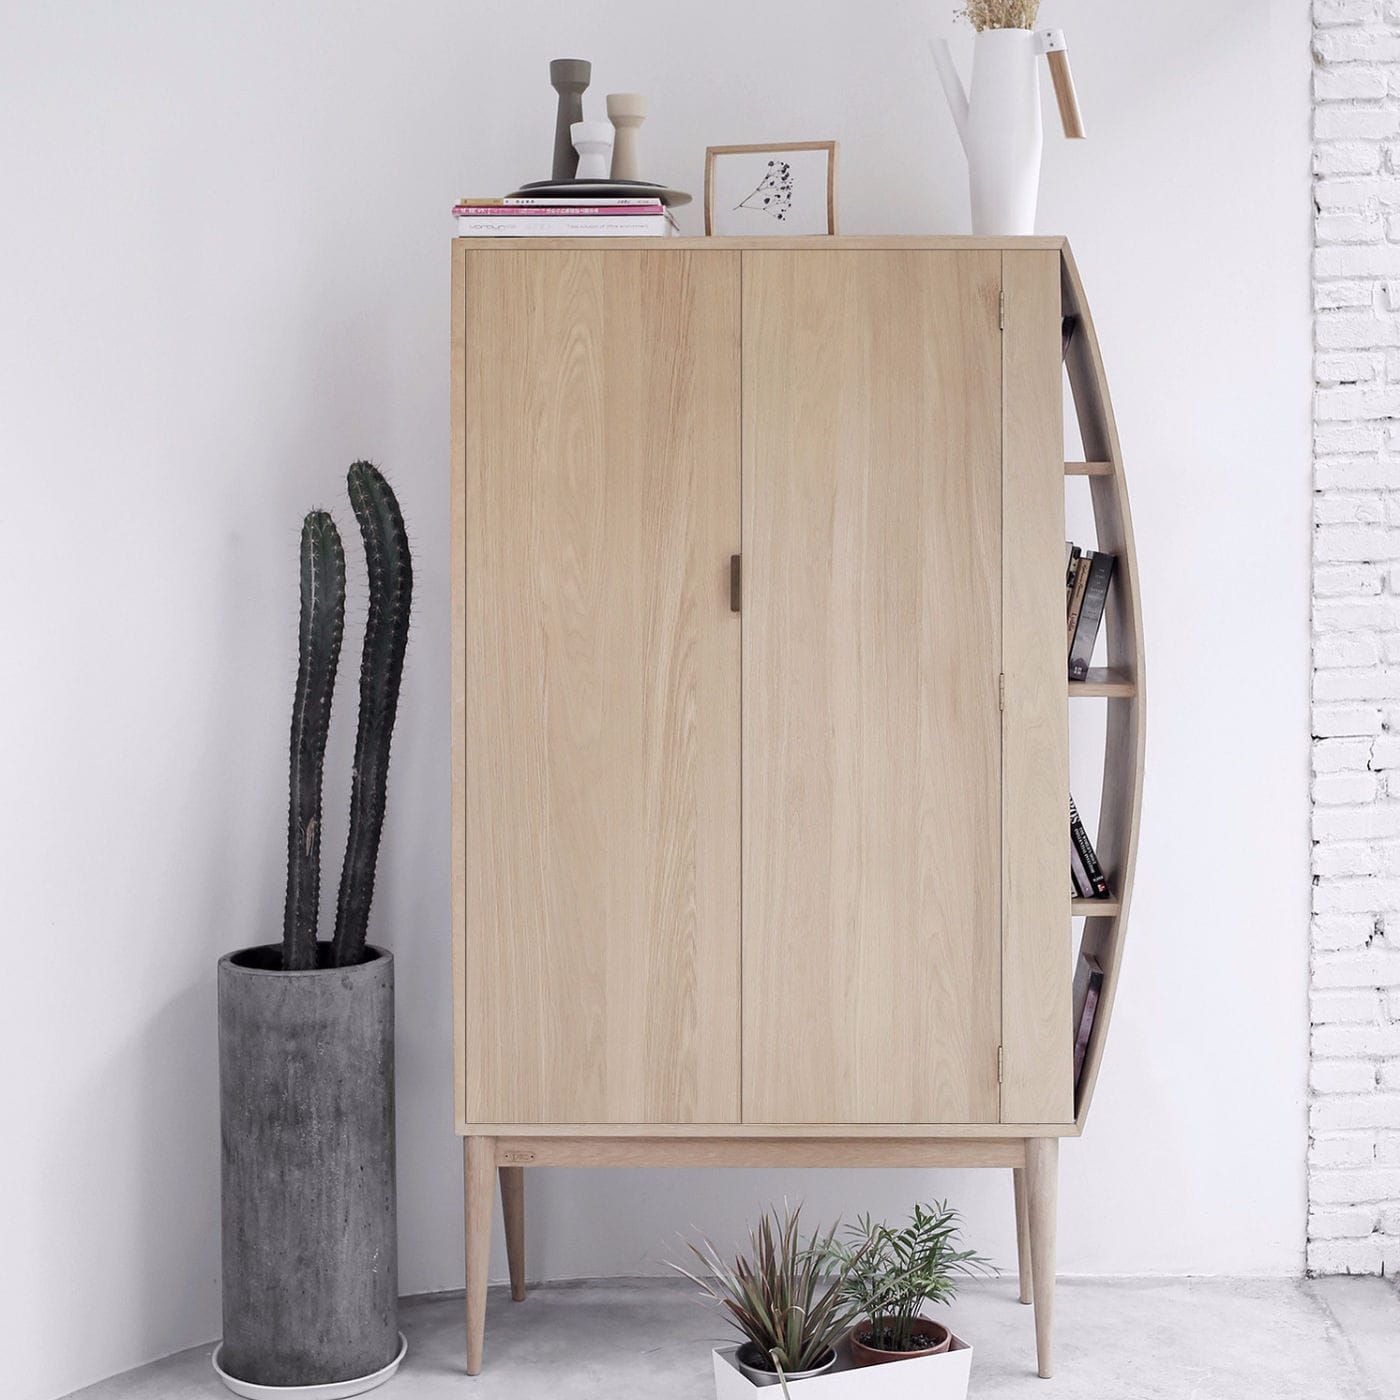 Moderner Wohnzimmerschrank / Holz - REACHING - Ziinlife